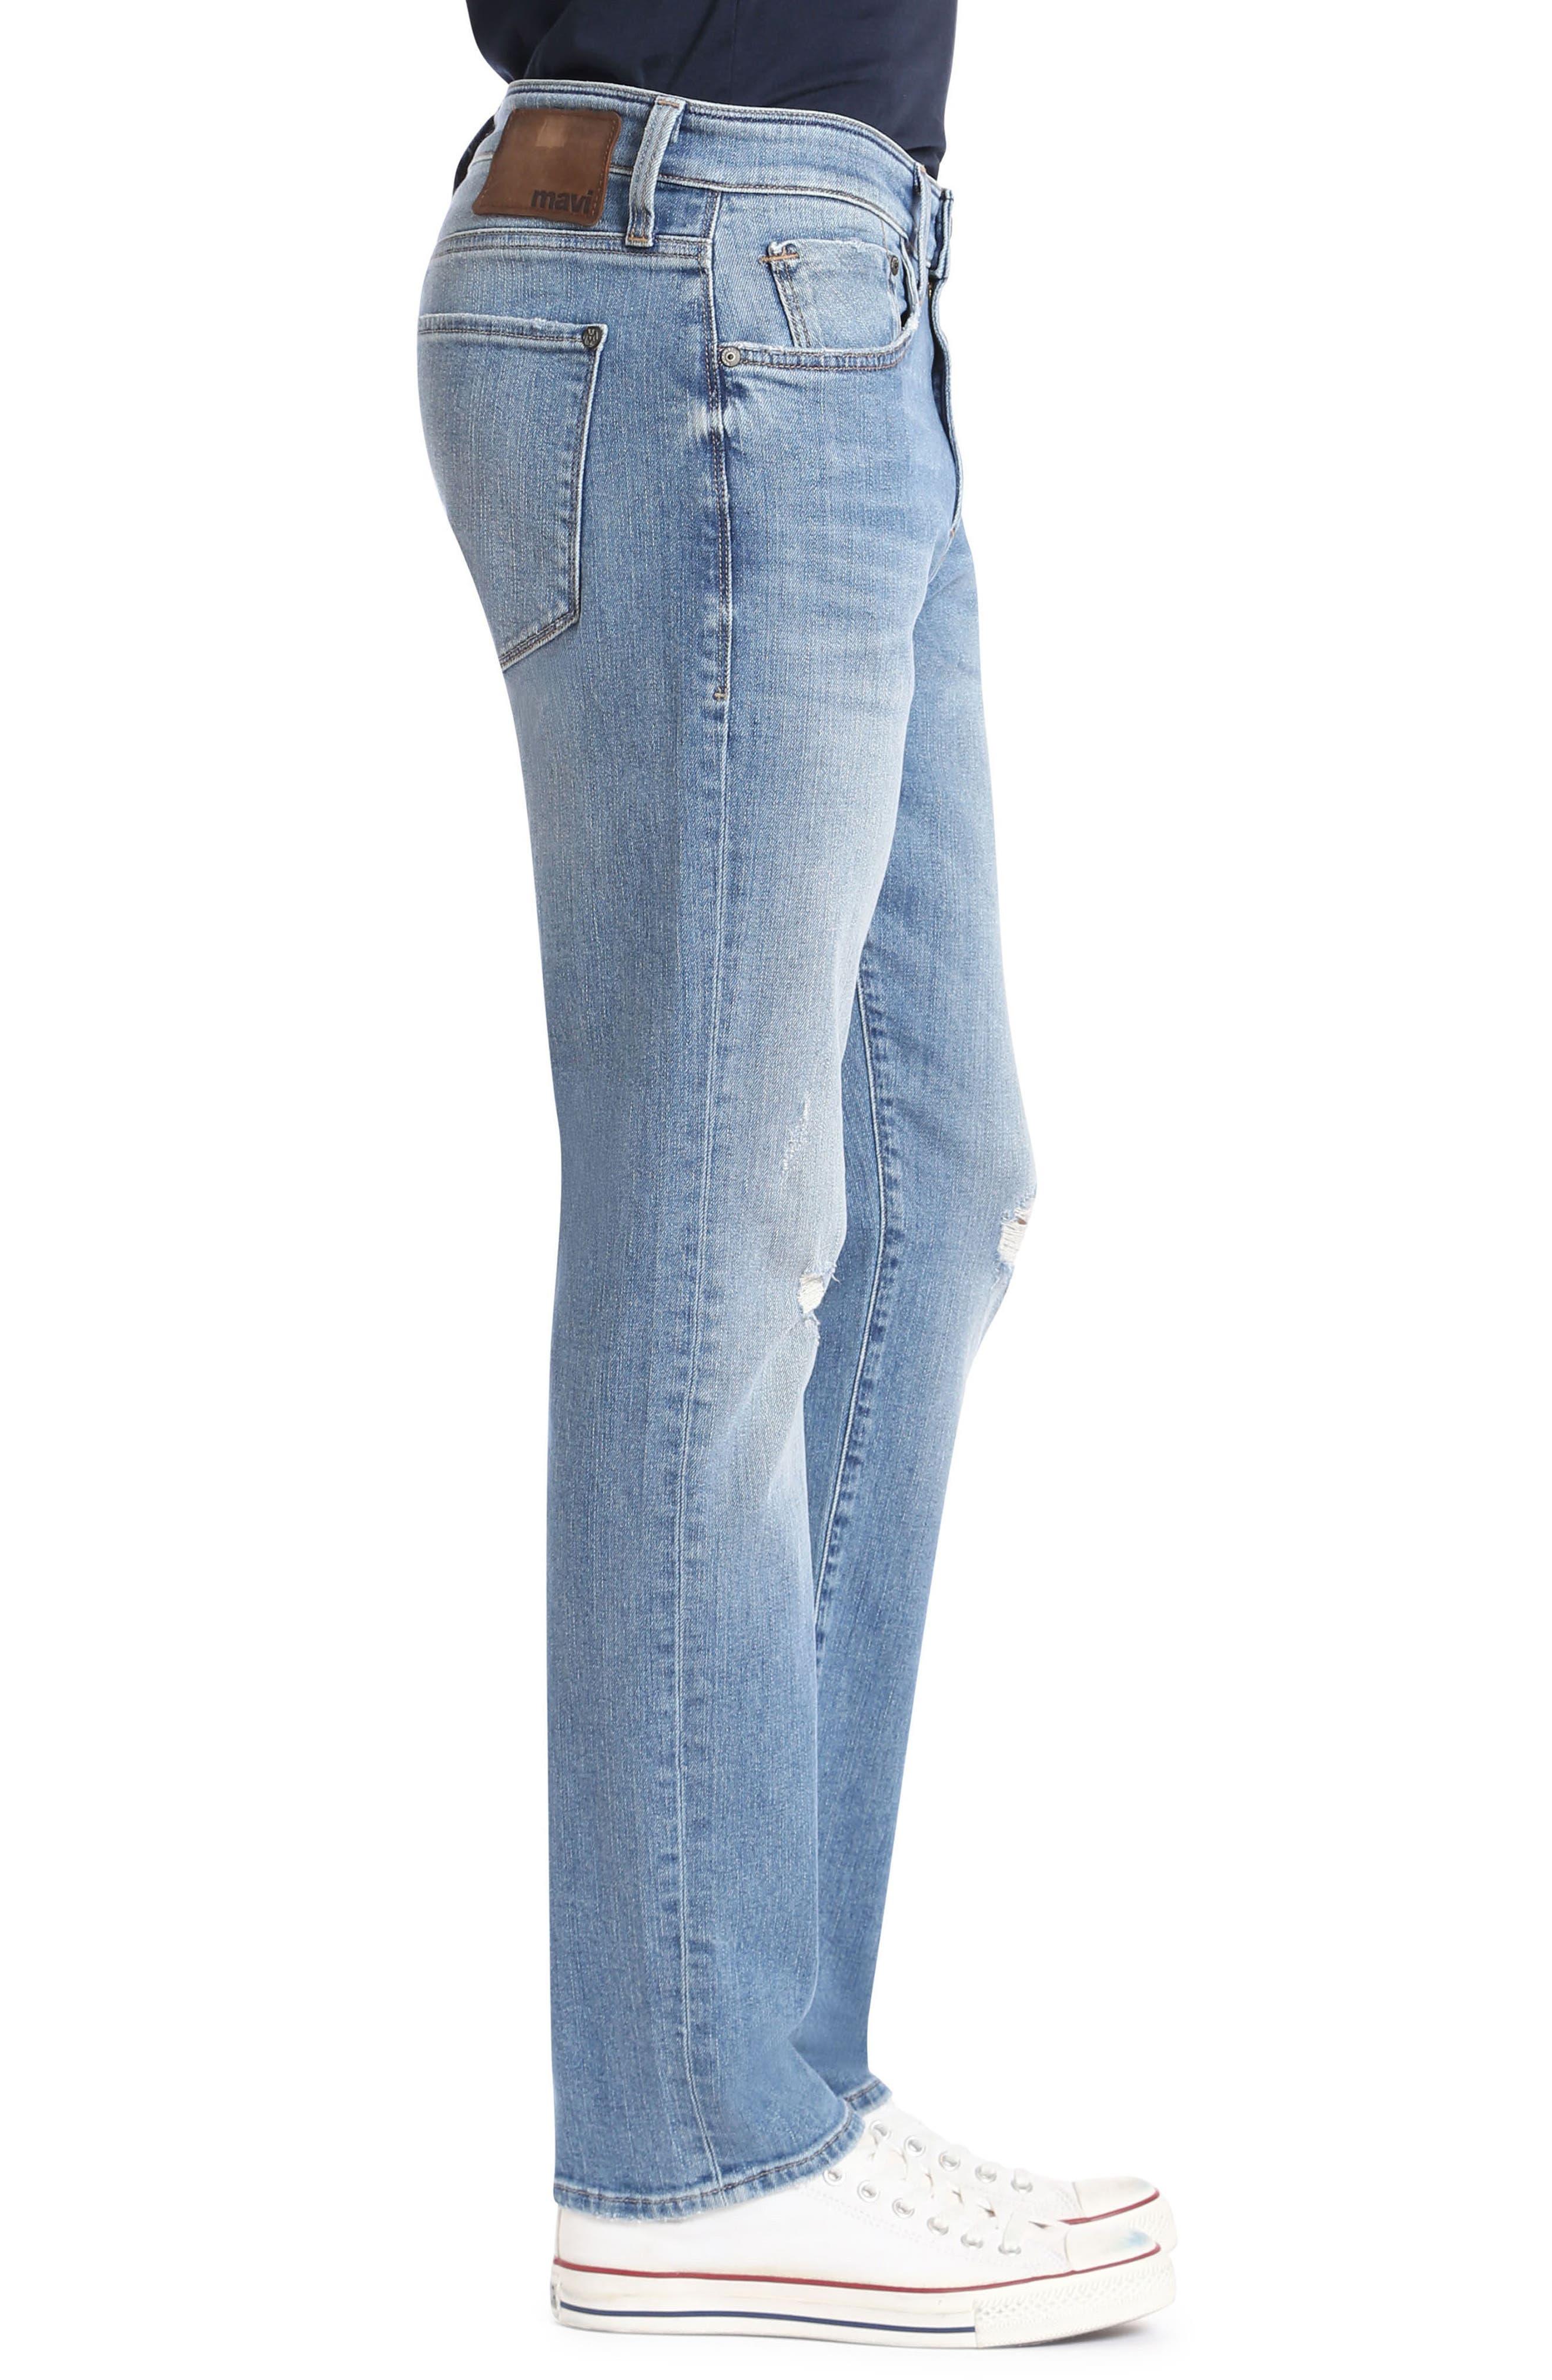 Marcus Slim Straight Leg Jeans,                             Alternate thumbnail 3, color,                             Light Used Authentic Vintage